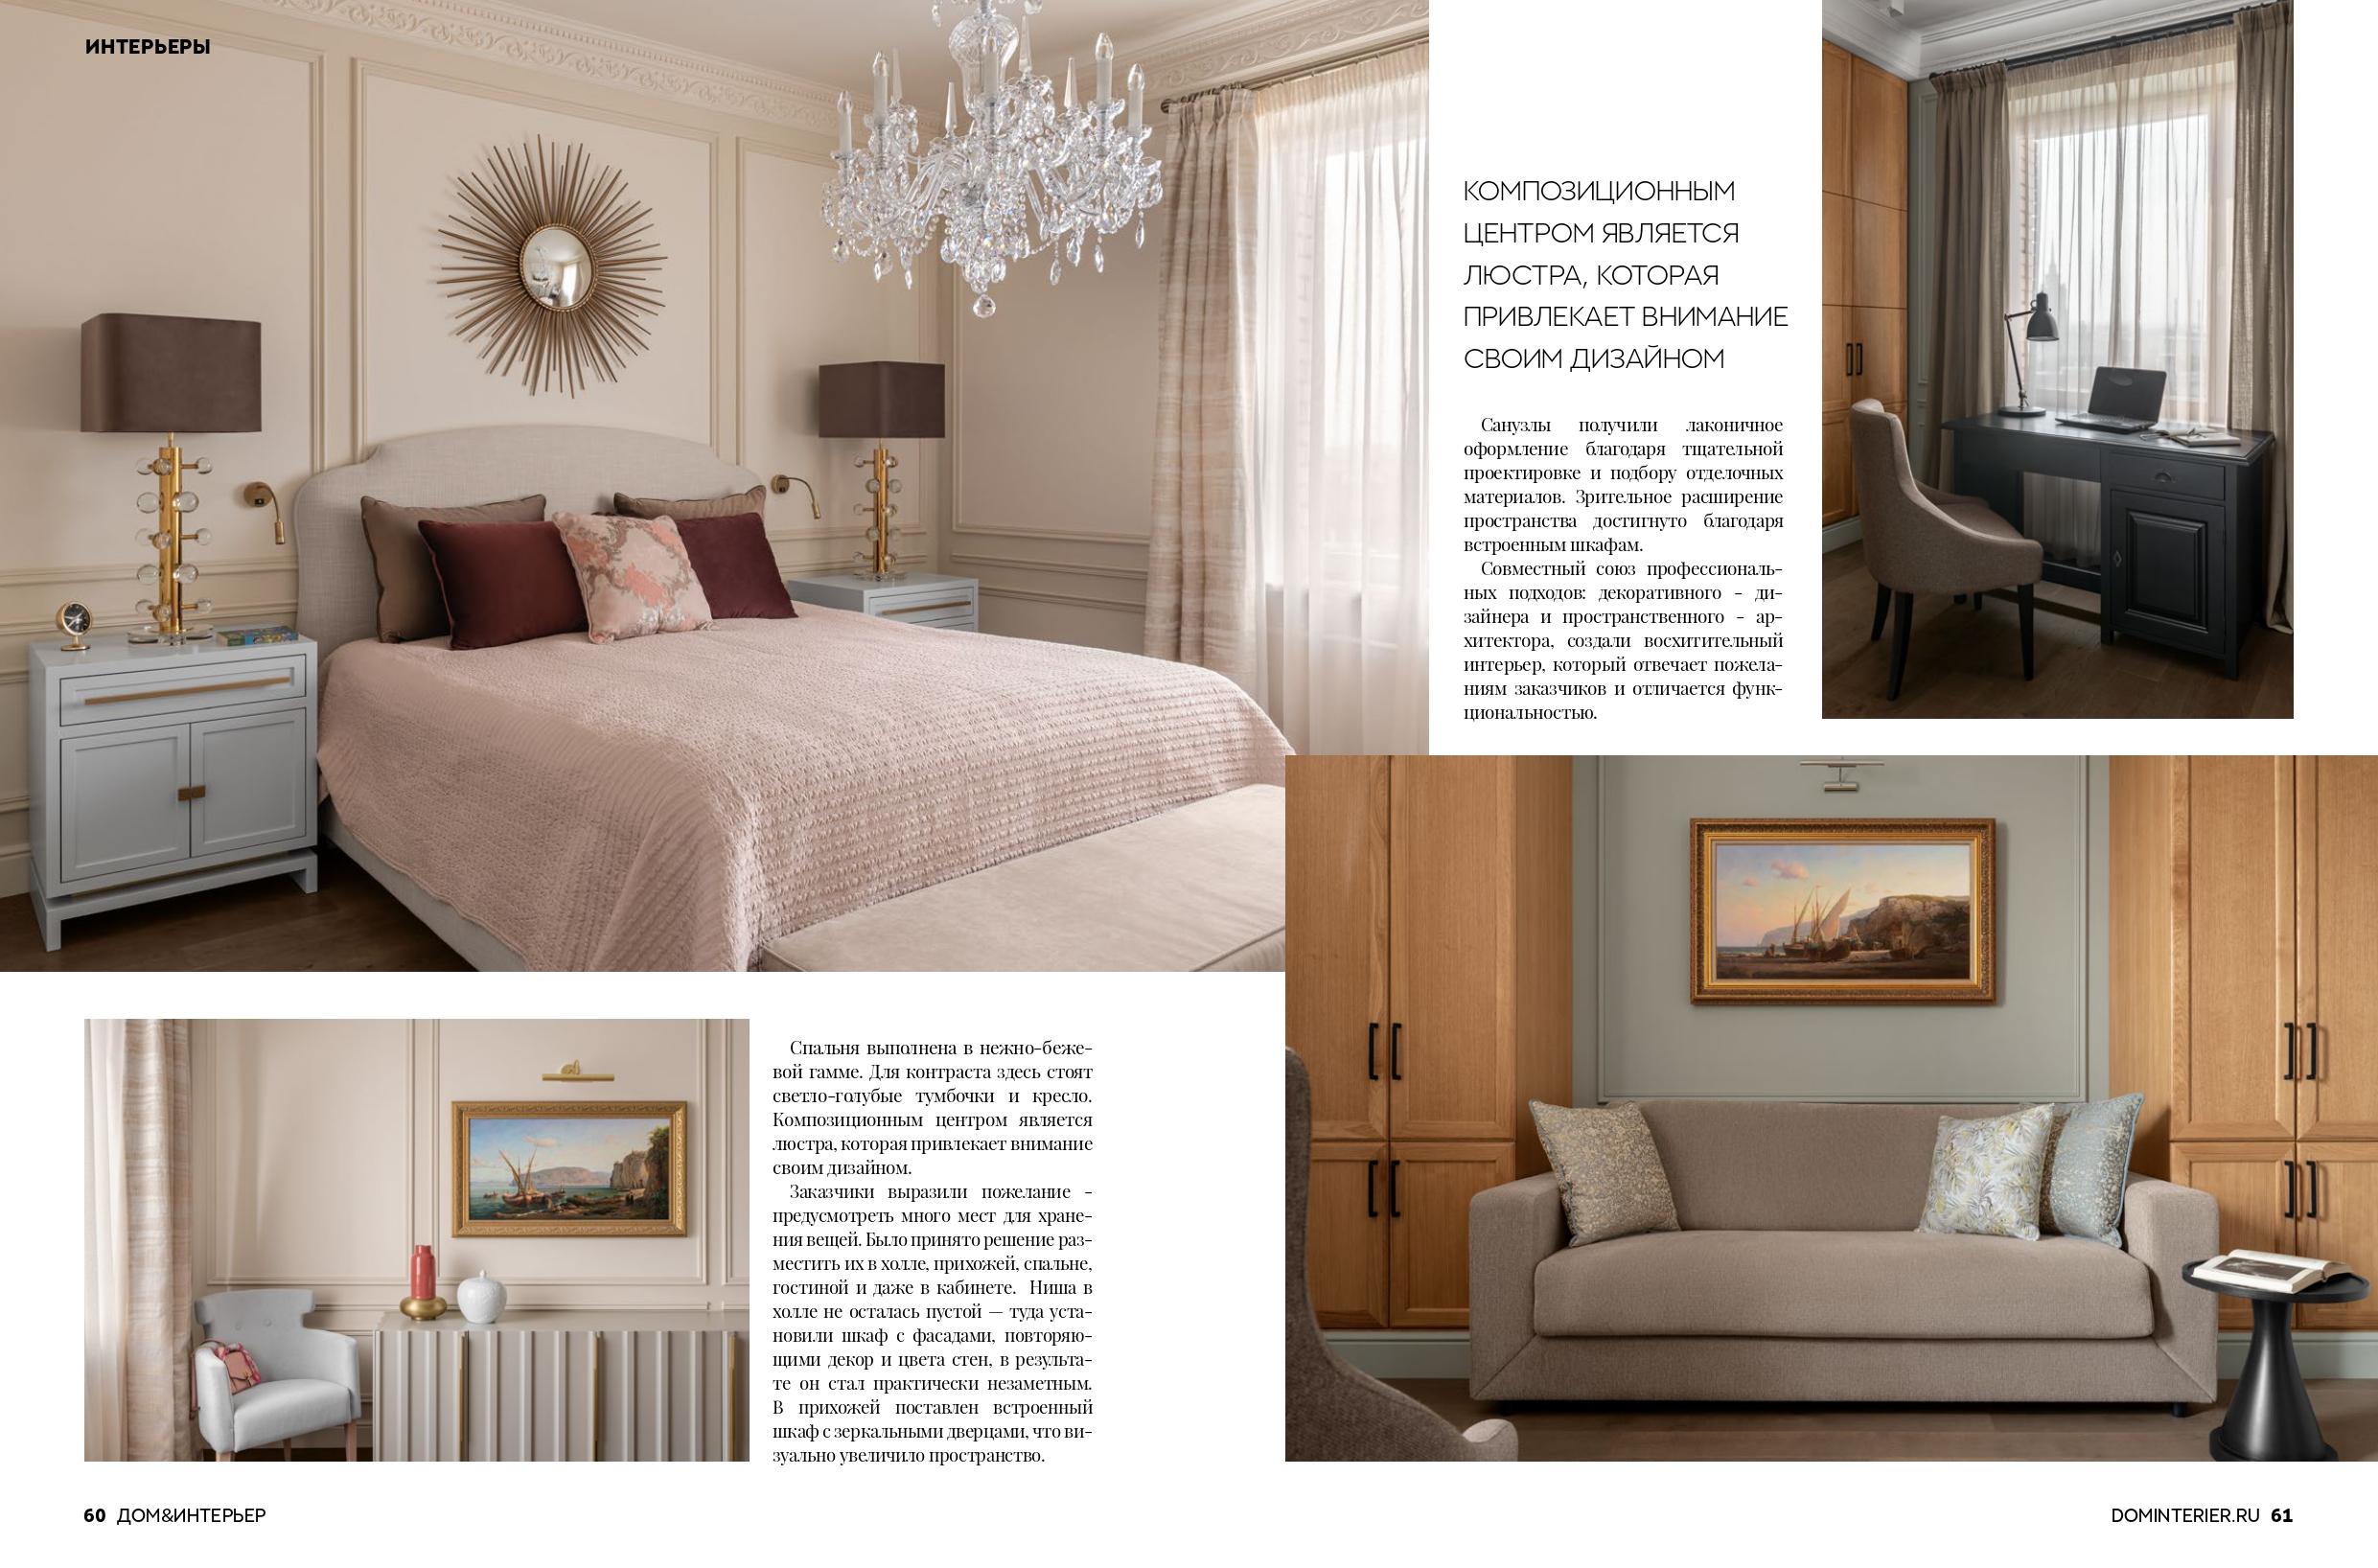 DI265_VozdushnayaKlassika_pages-to-jpg-0003